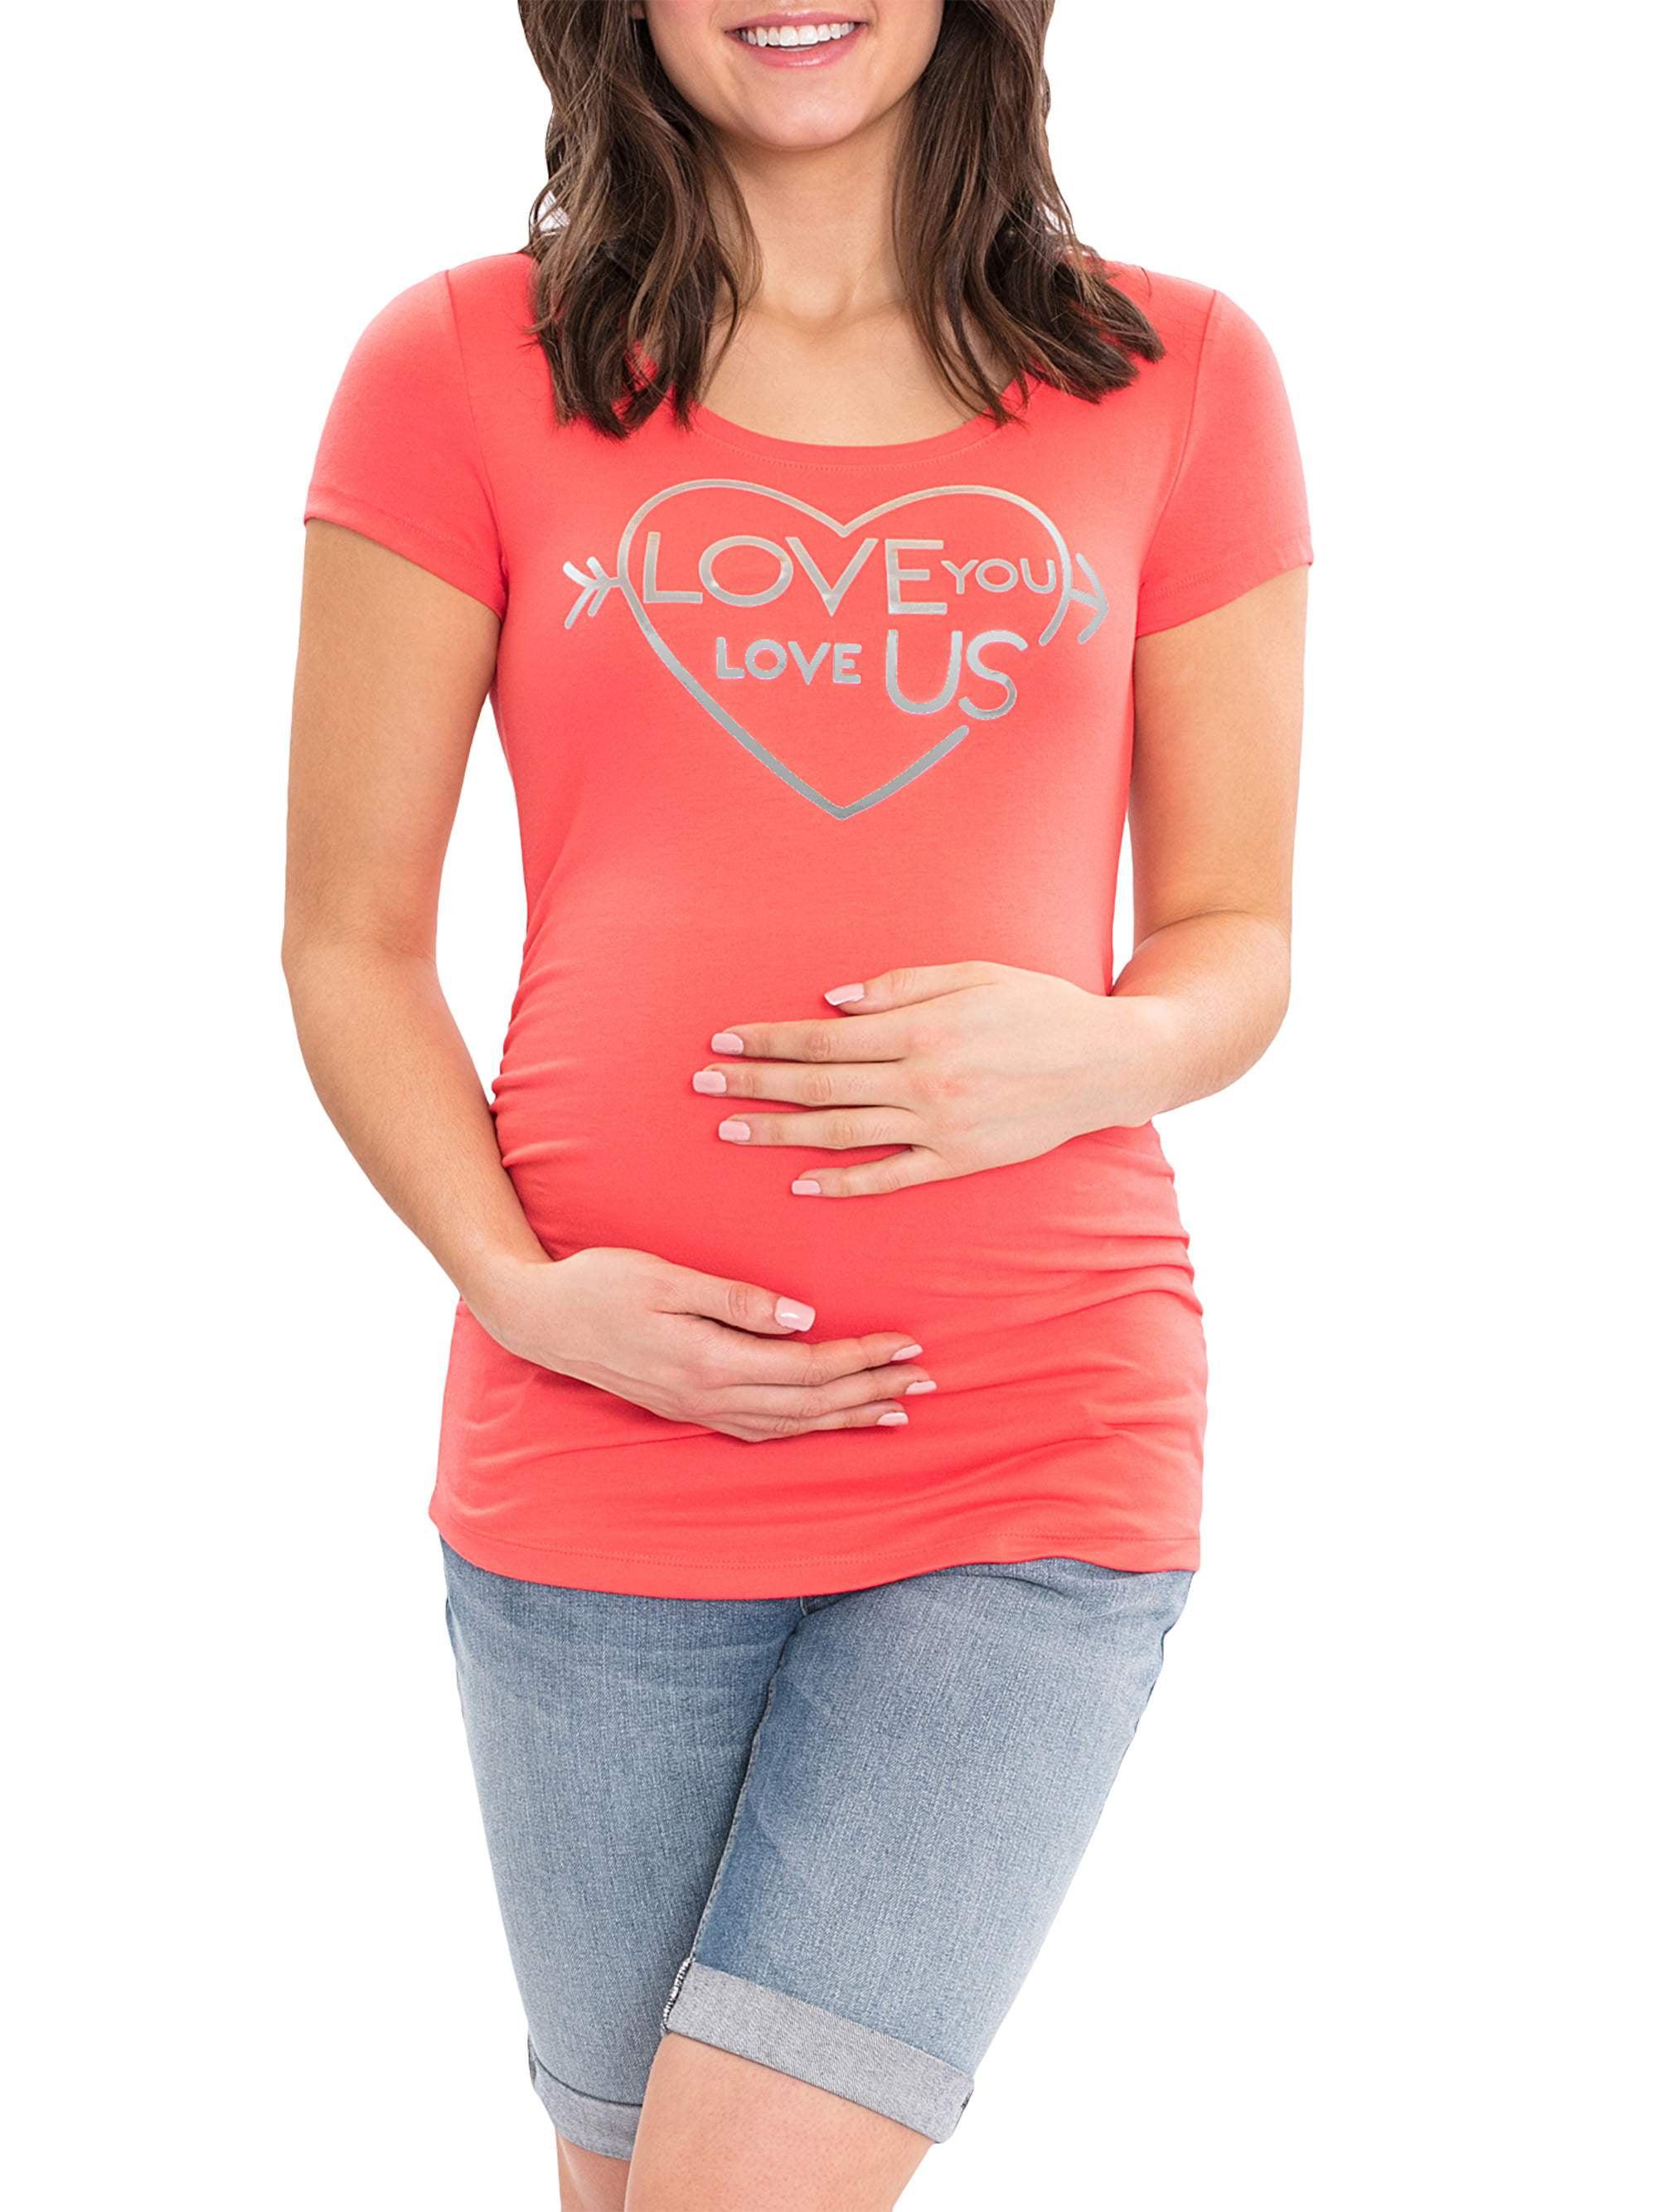 Maternity Short Sleeve Scoop Neck Tshirt by Garan Mfg. Corp.